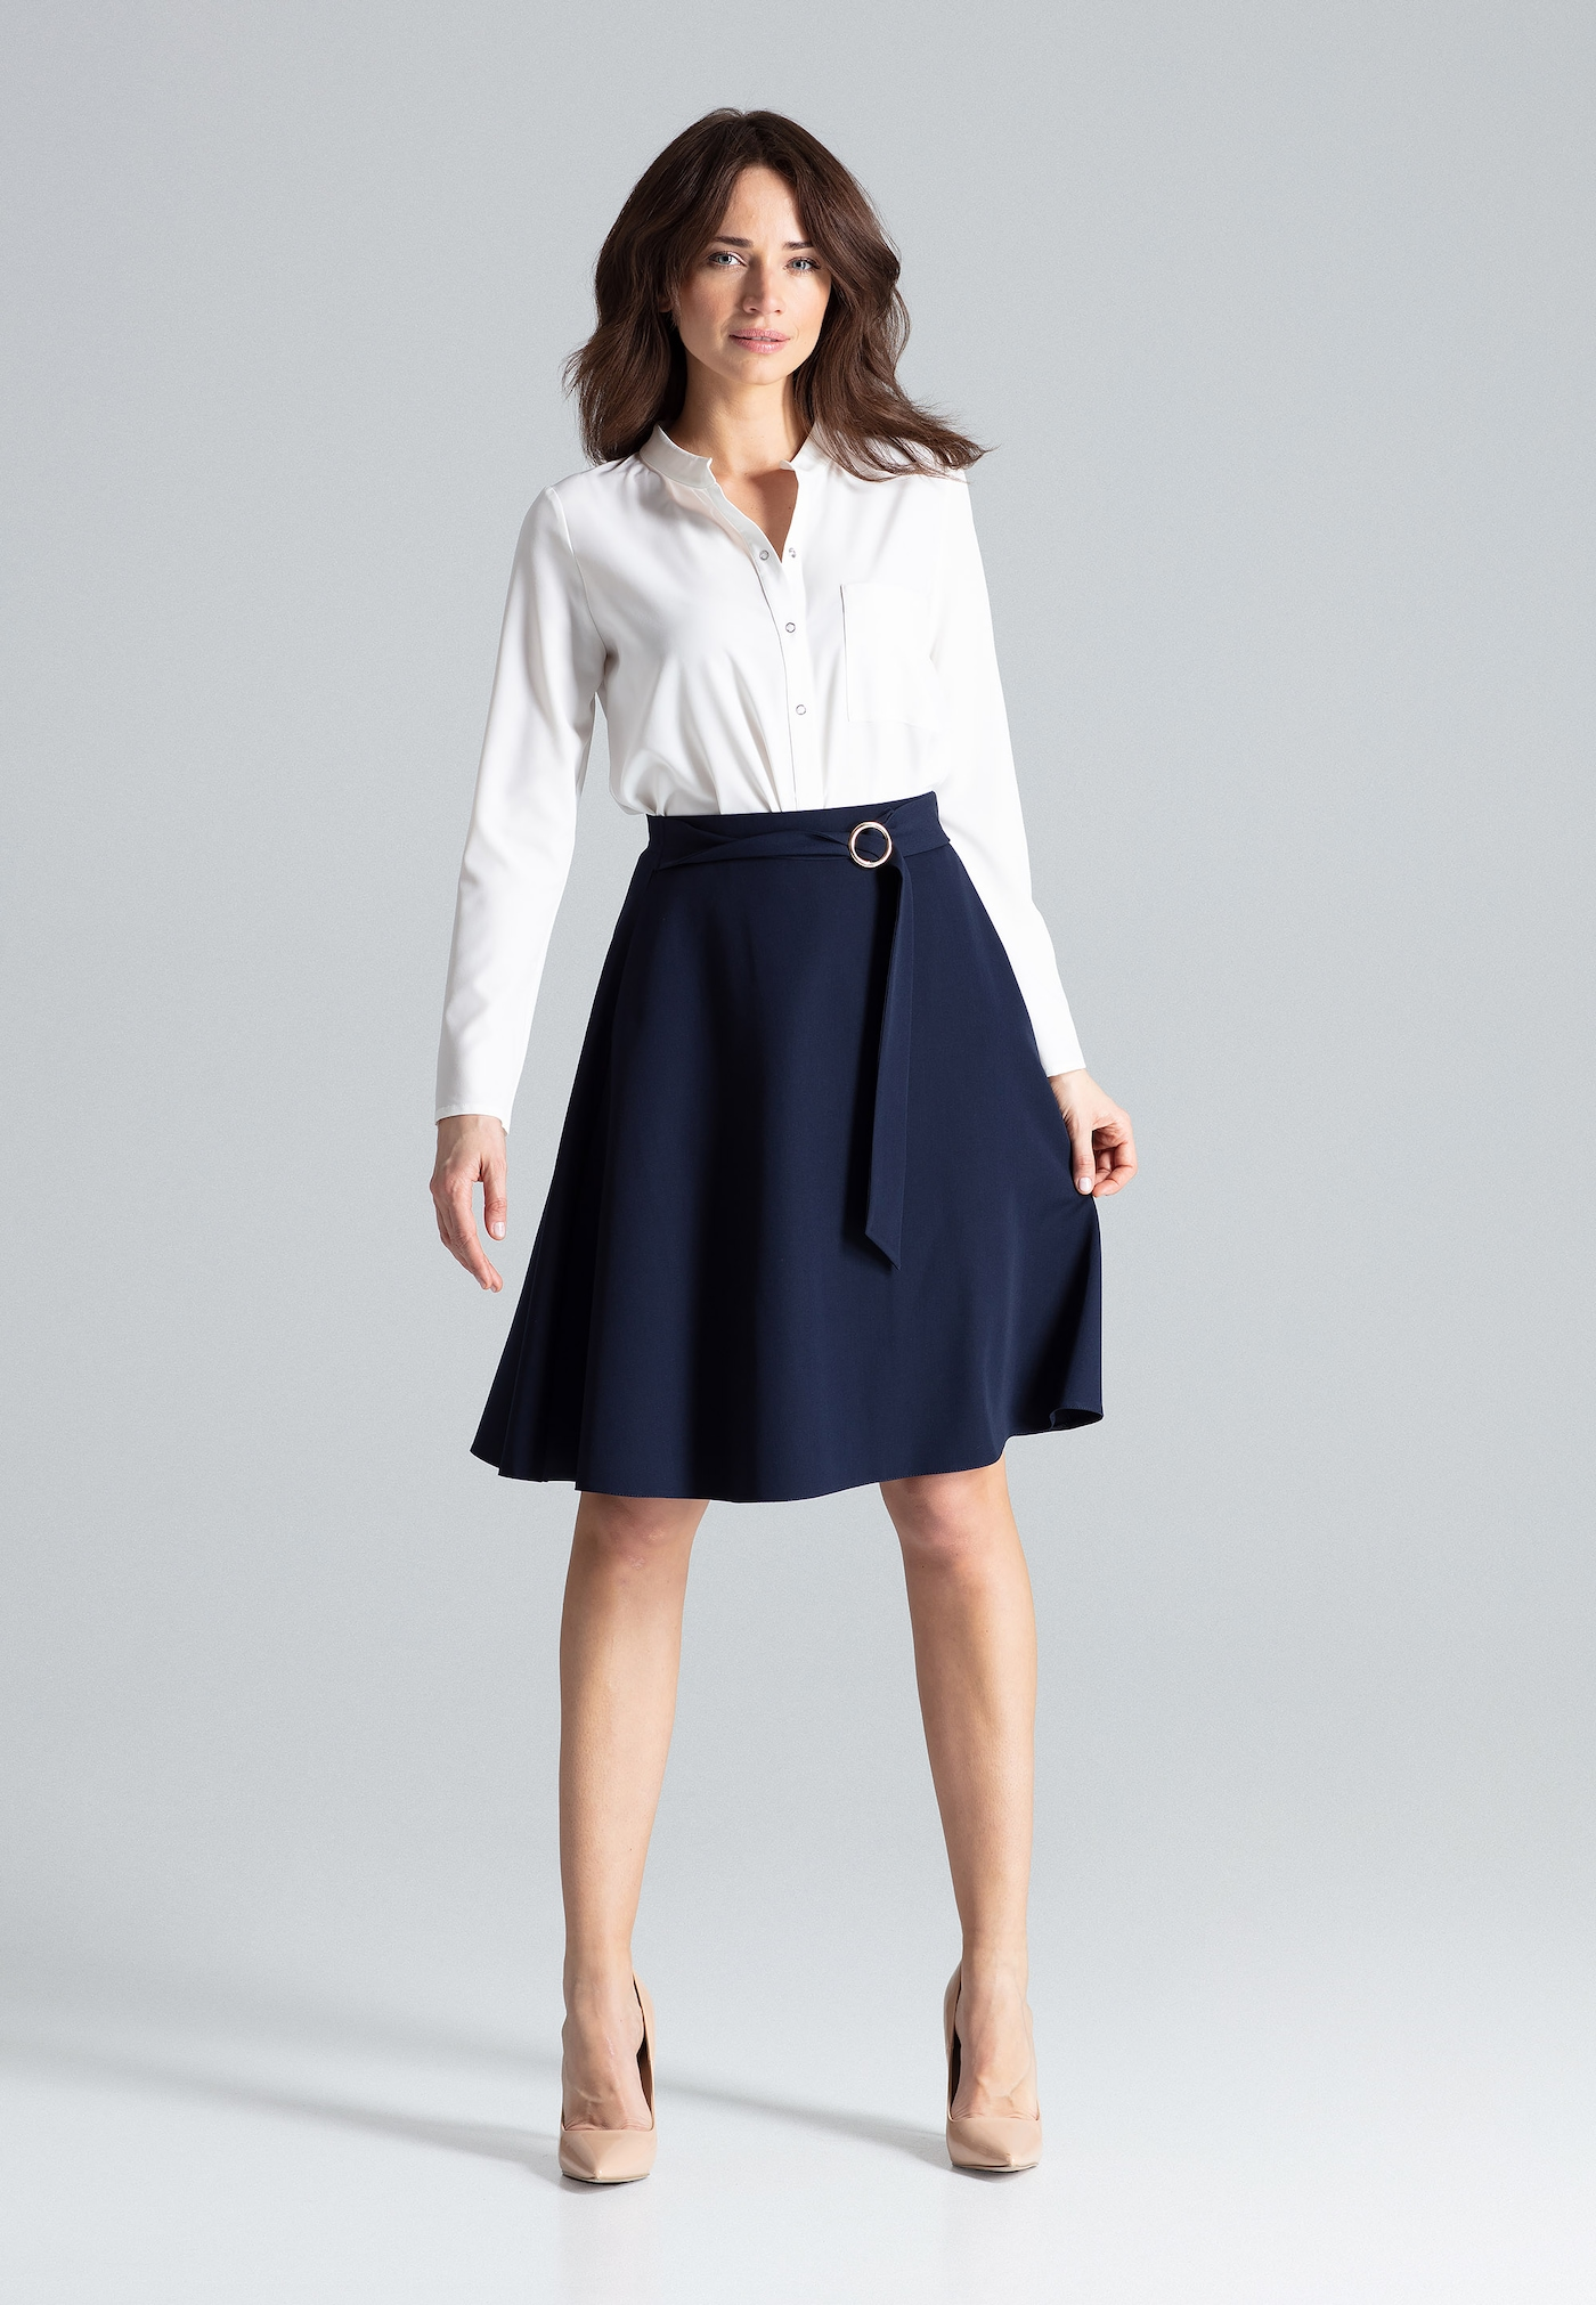 Lenitif Woman's Skirt L038